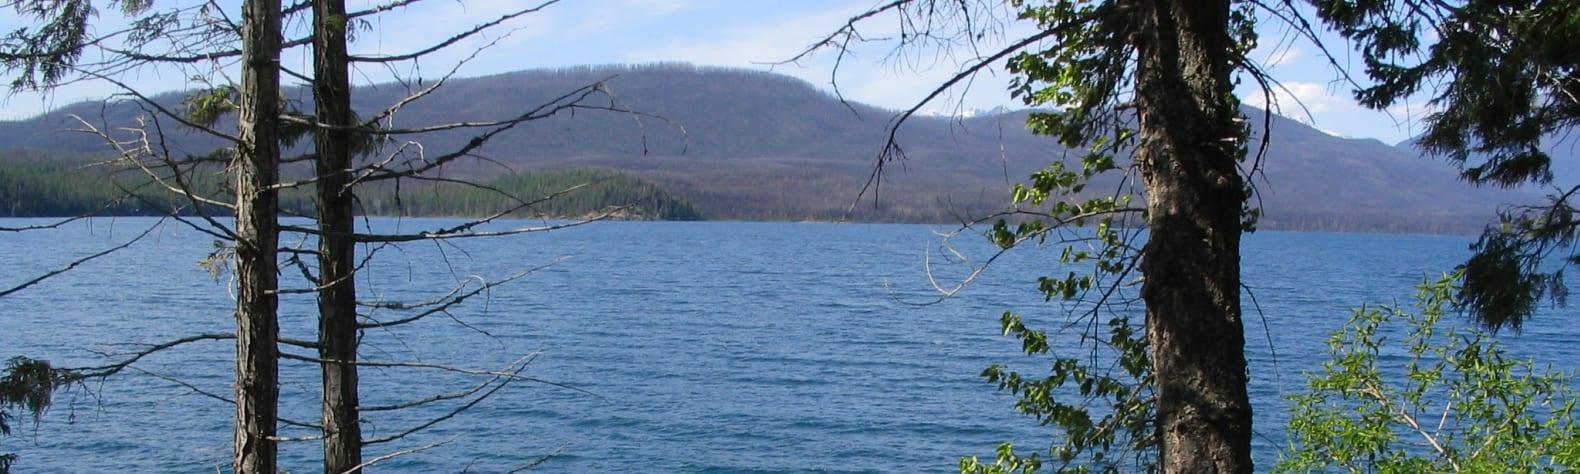 Salmon Lake State Park